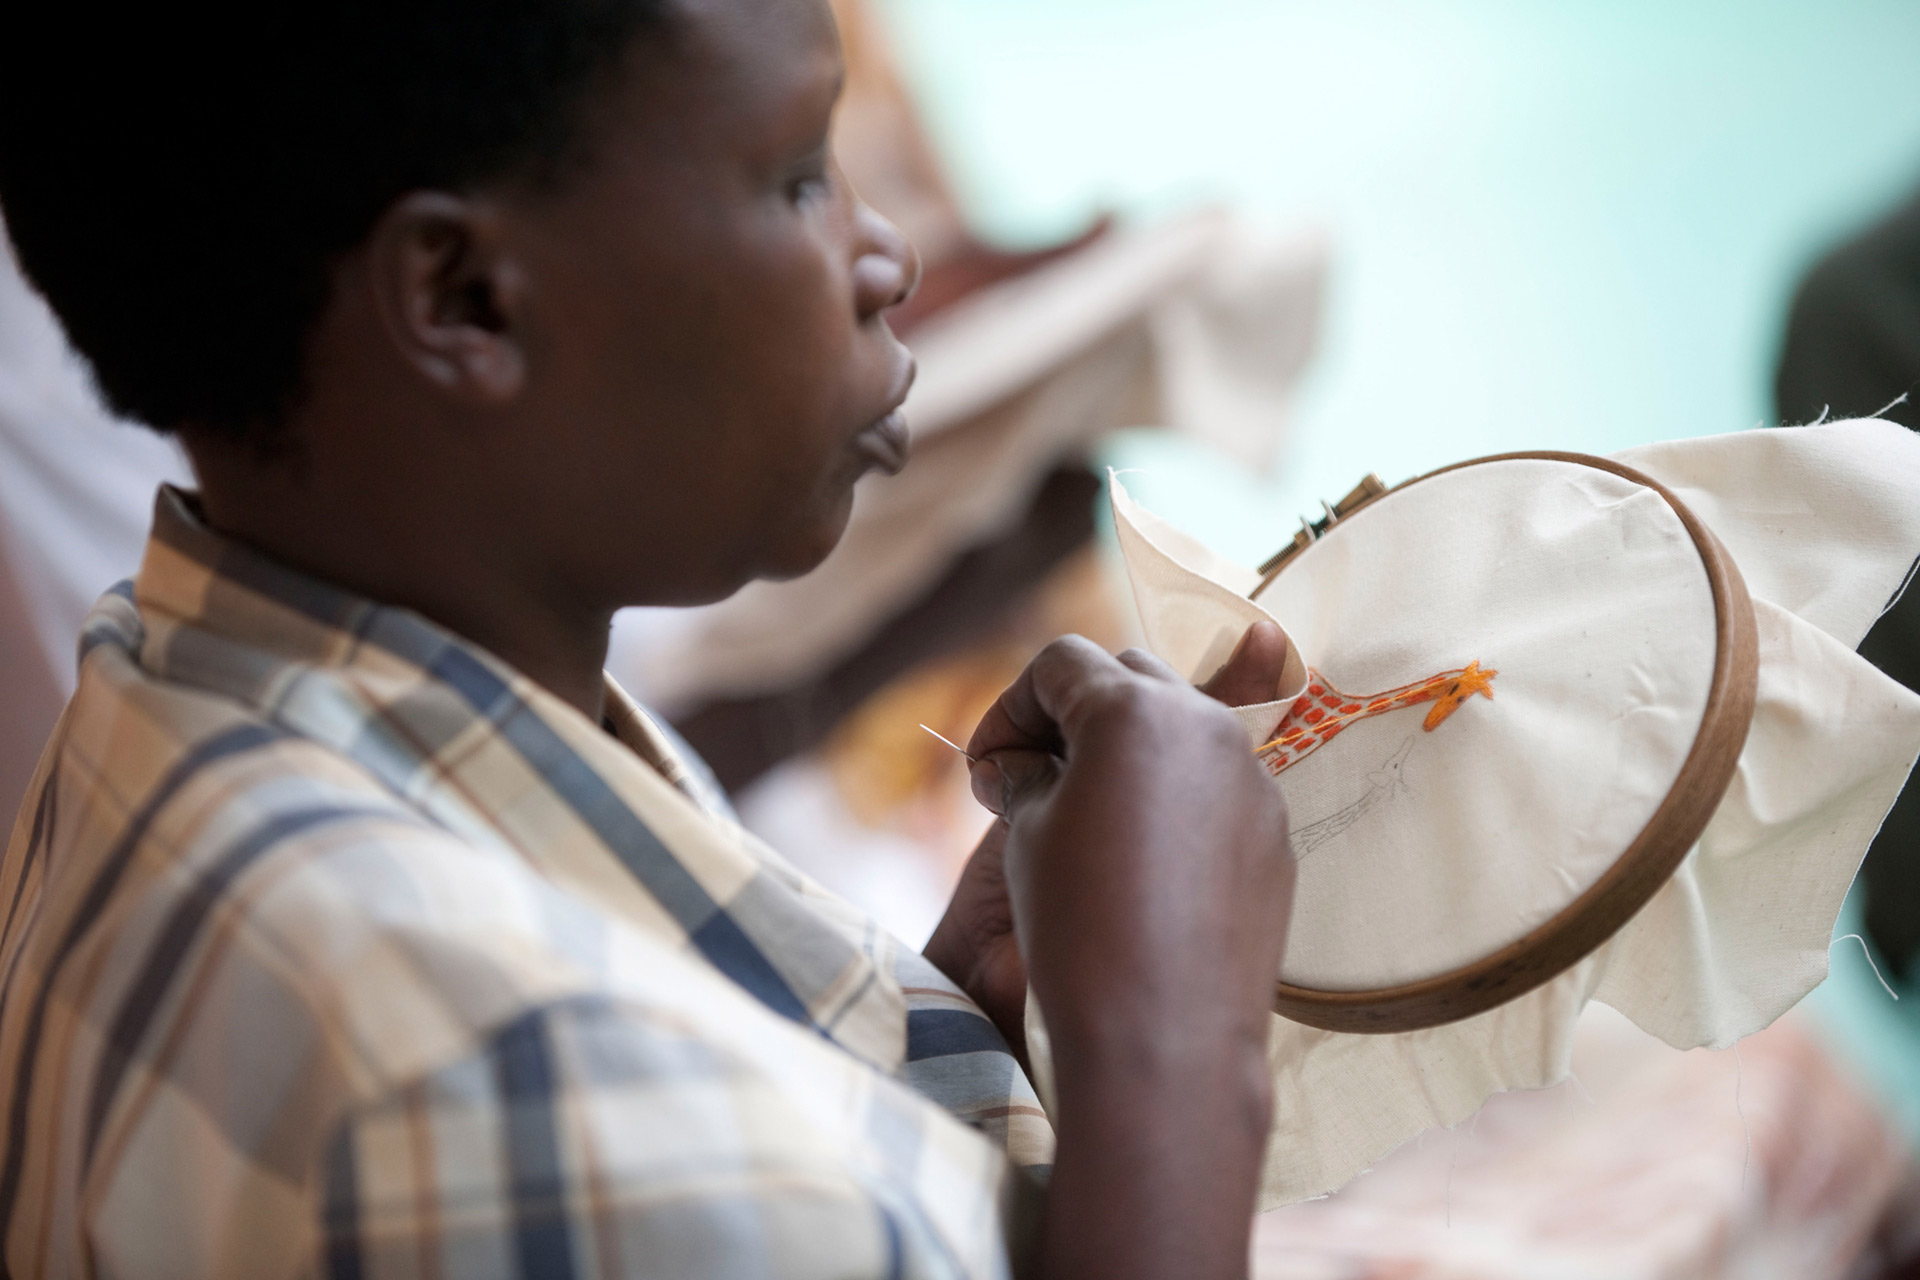 Broderie girafe - embroidery giraffe Ibaba Rwanda